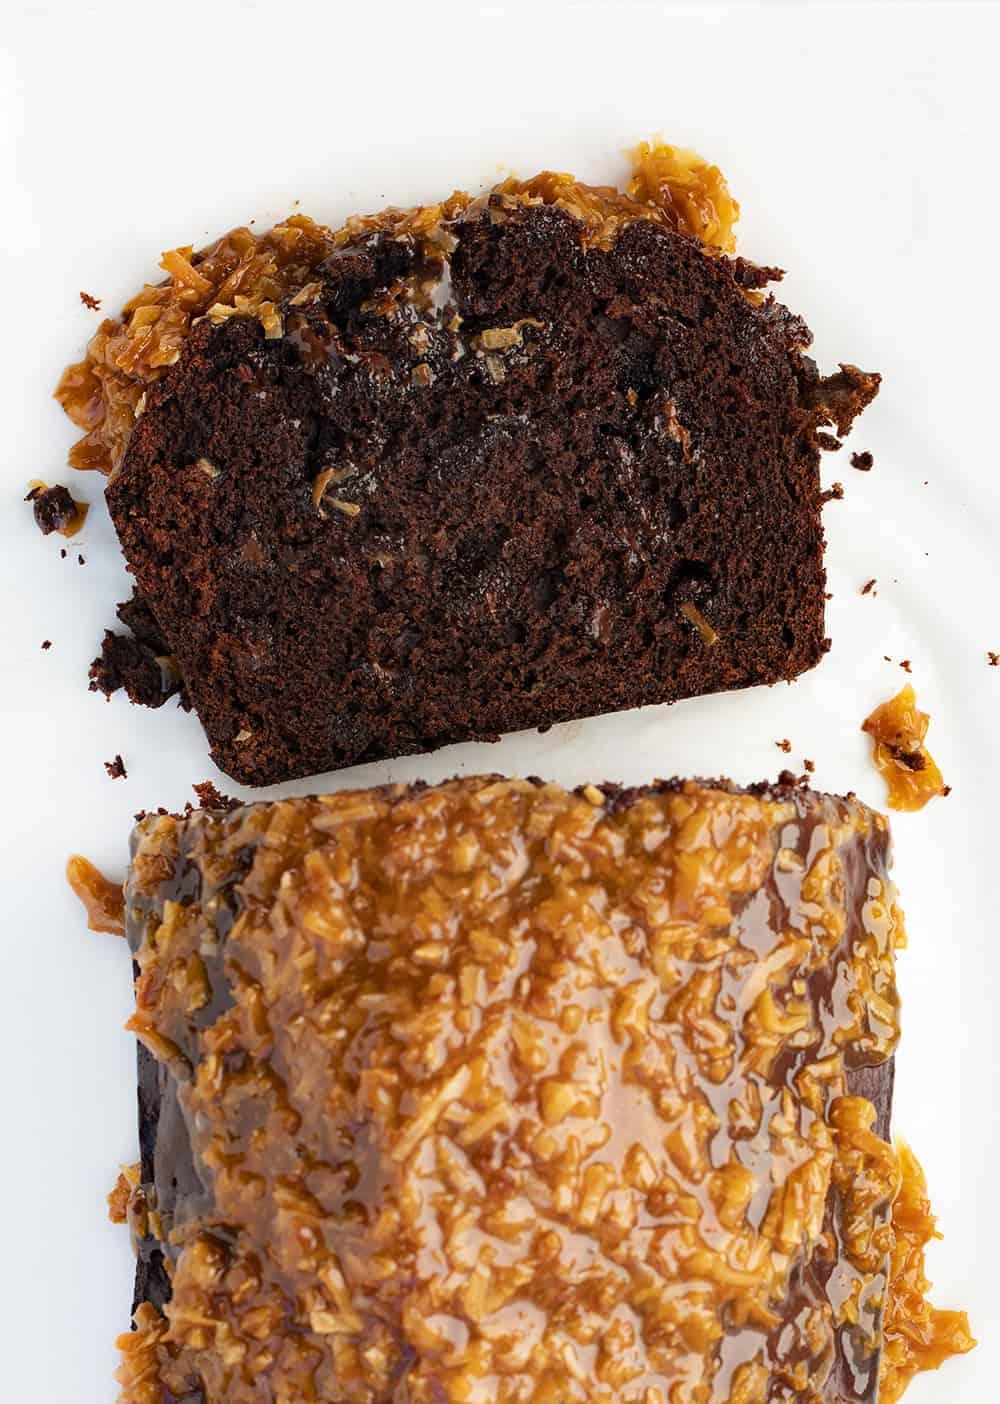 Toasted Coconut Chocolate Banana Bread Recipe - Samoa Bread with Slice Cut